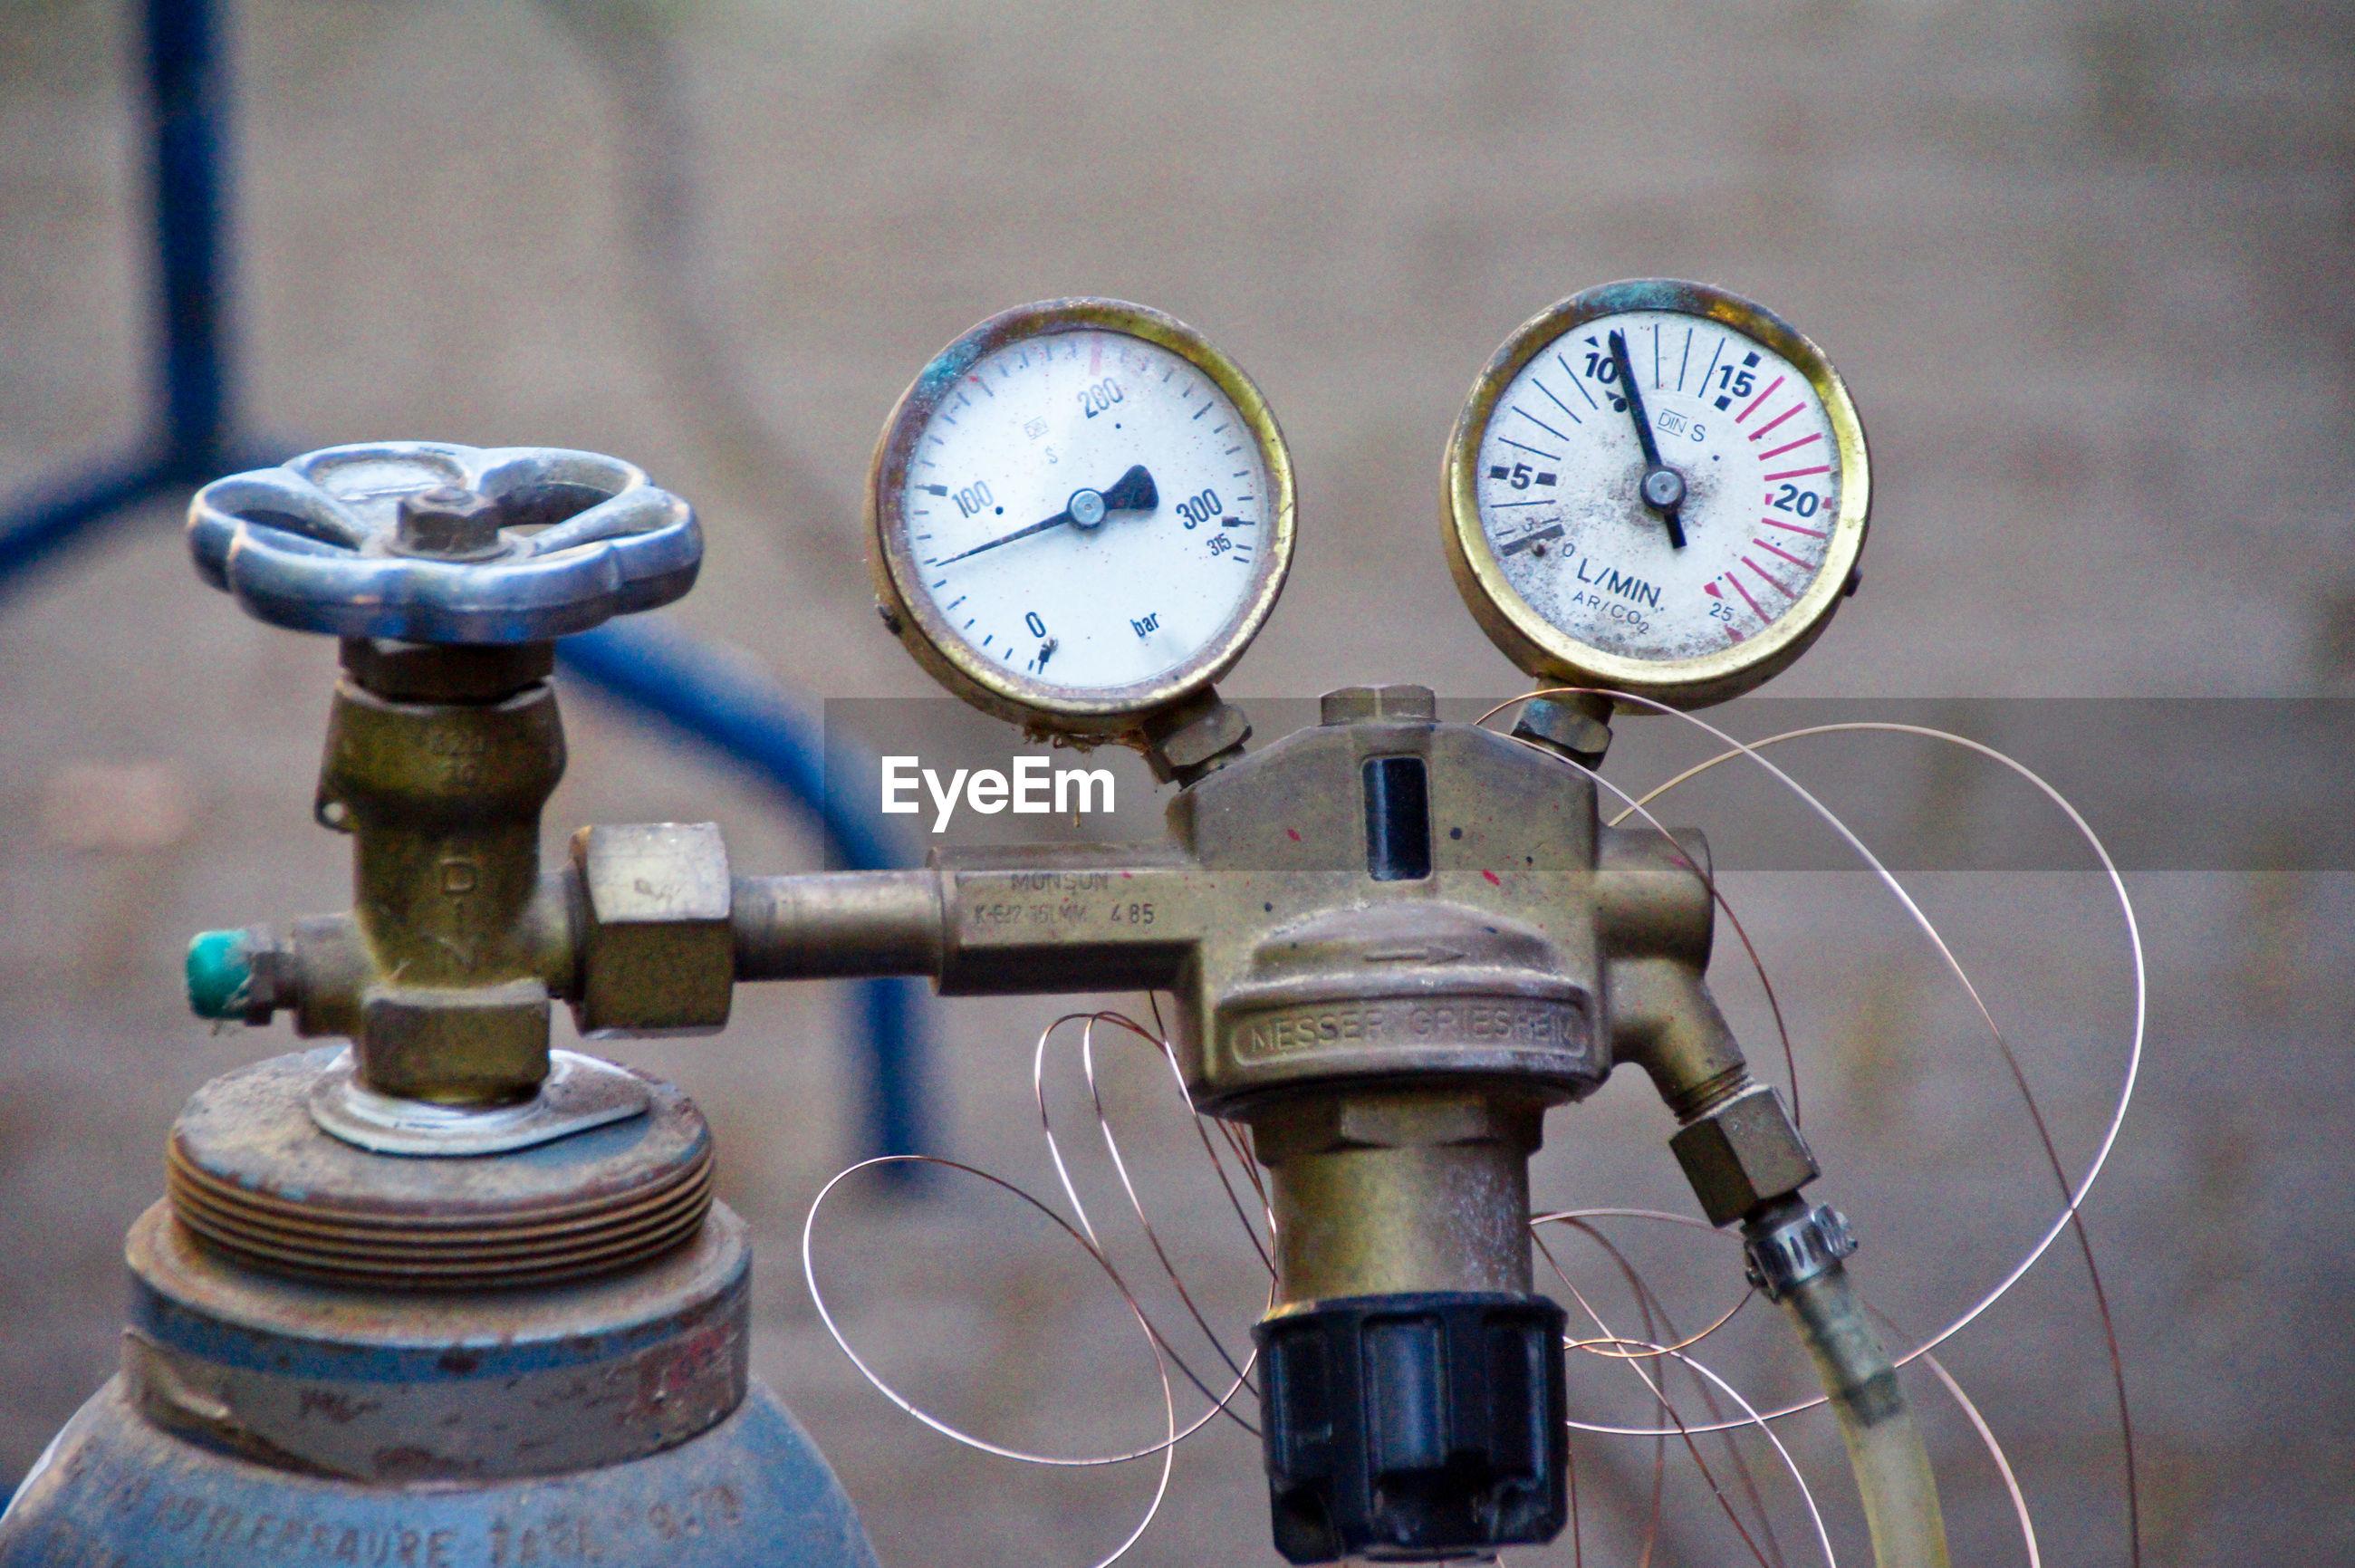 Close-up of machine valve and